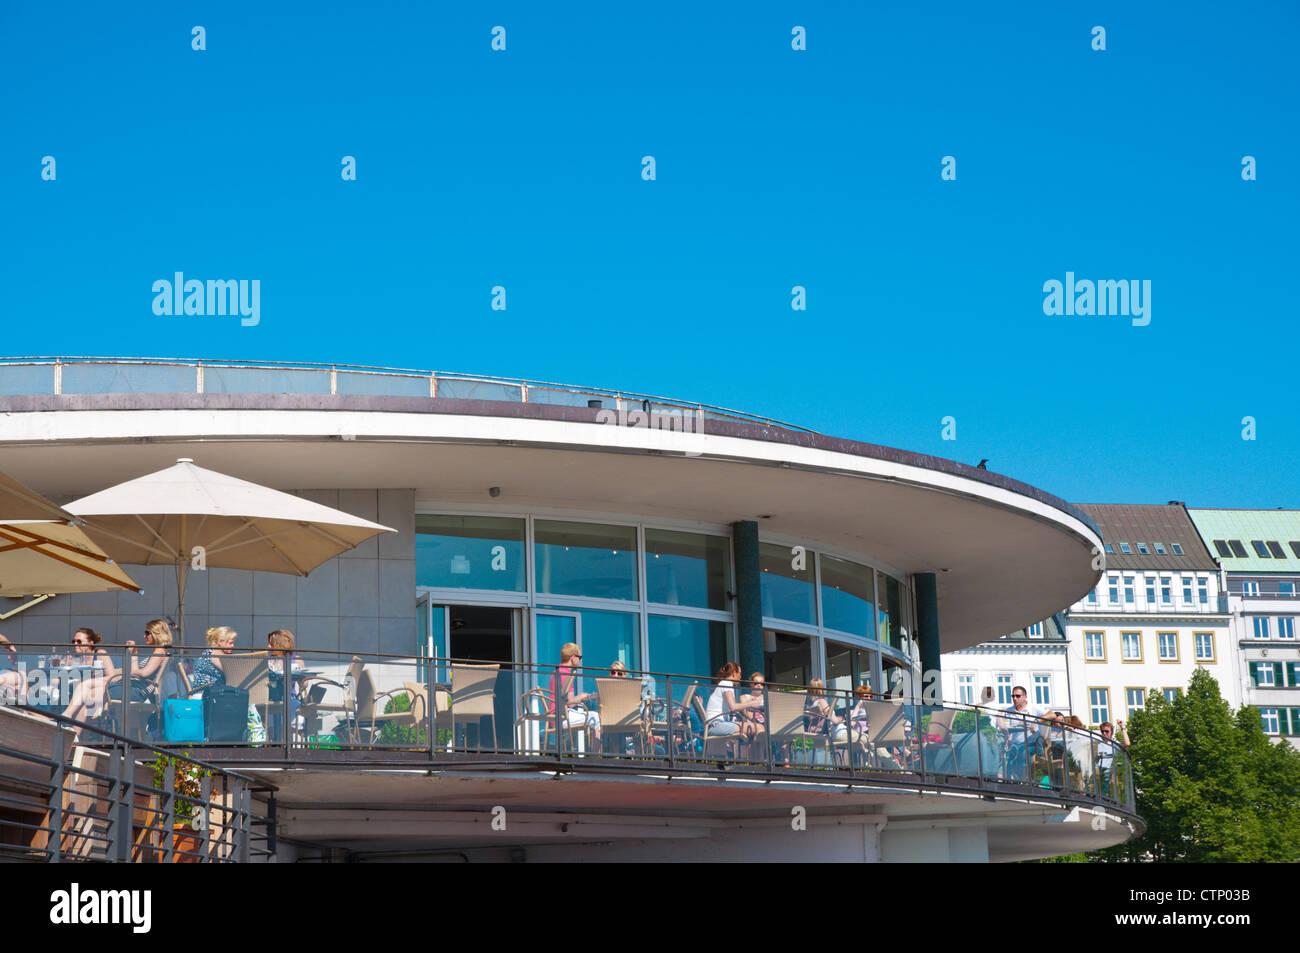 Lakeside Bar Stock Photos & Lakeside Bar Stock Images - Alamy